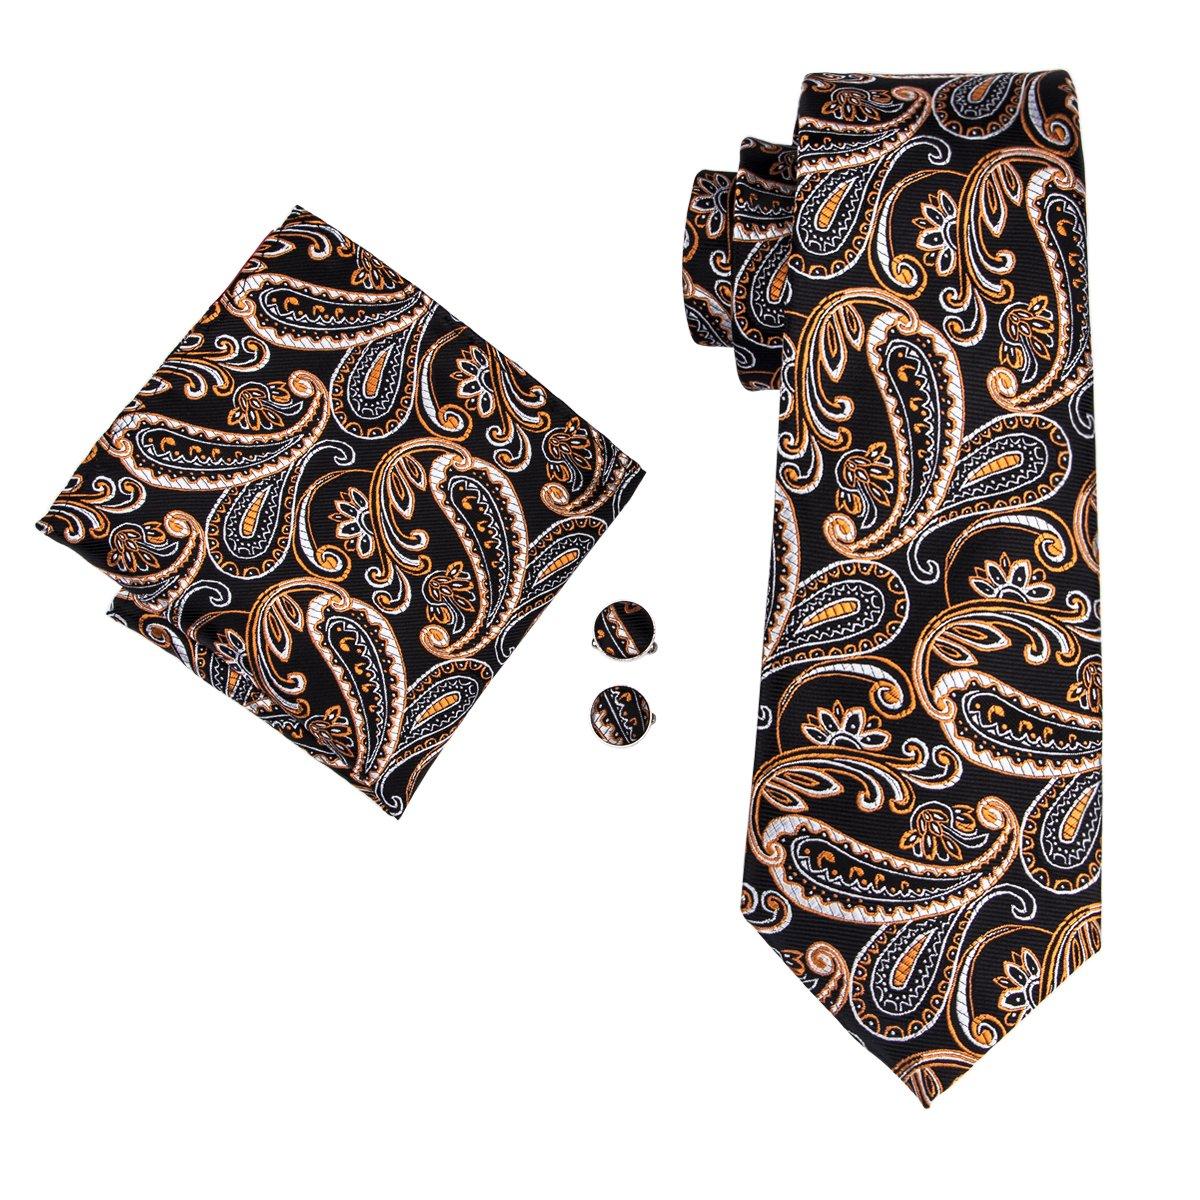 DiBanGu Tie Paisley Silk Tie and Pocket Square Cufflinks Tie Clip Set Woven Necktie for Men